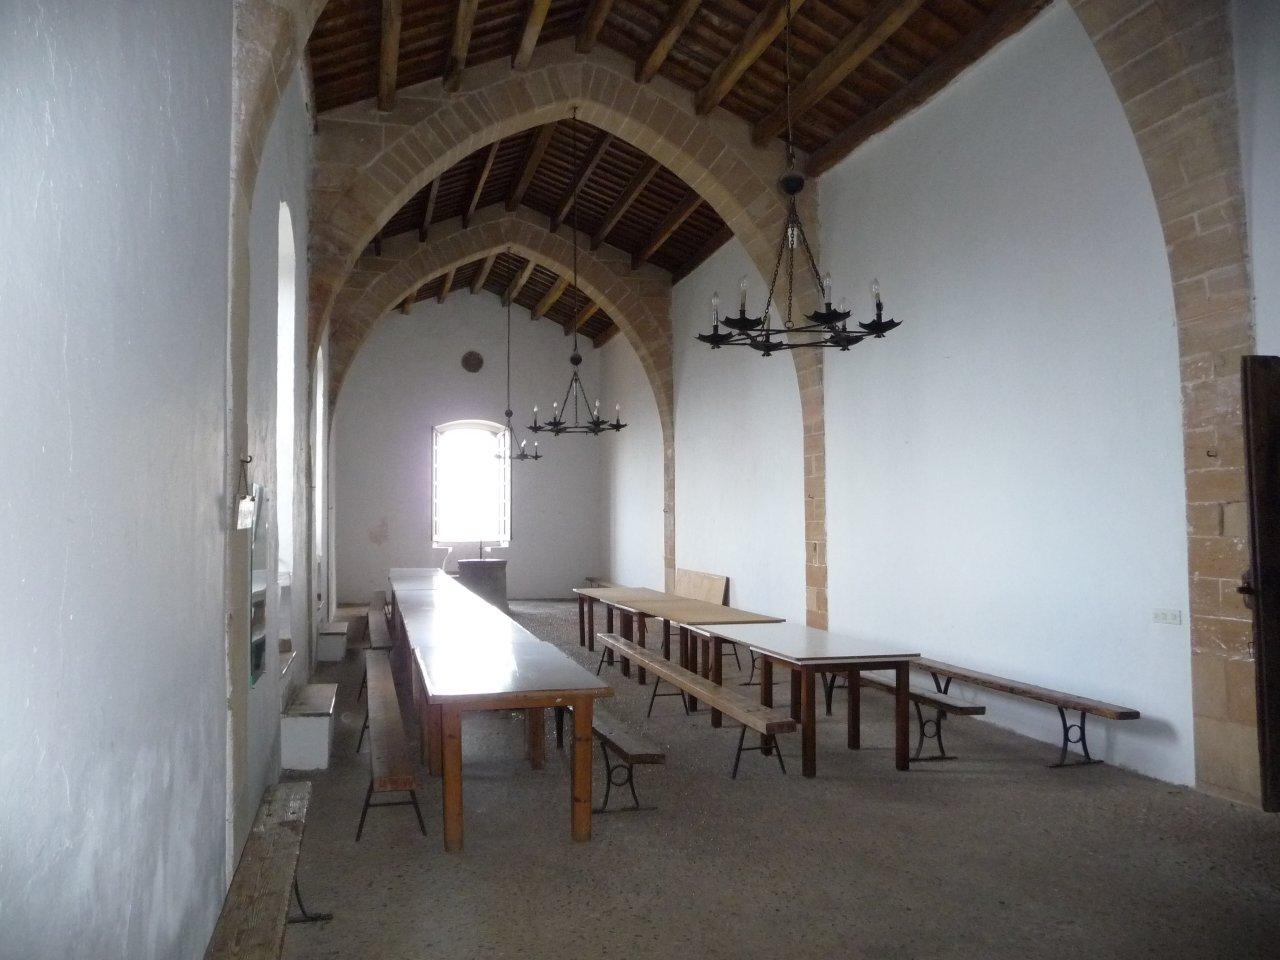 monastry puig maria dining hall